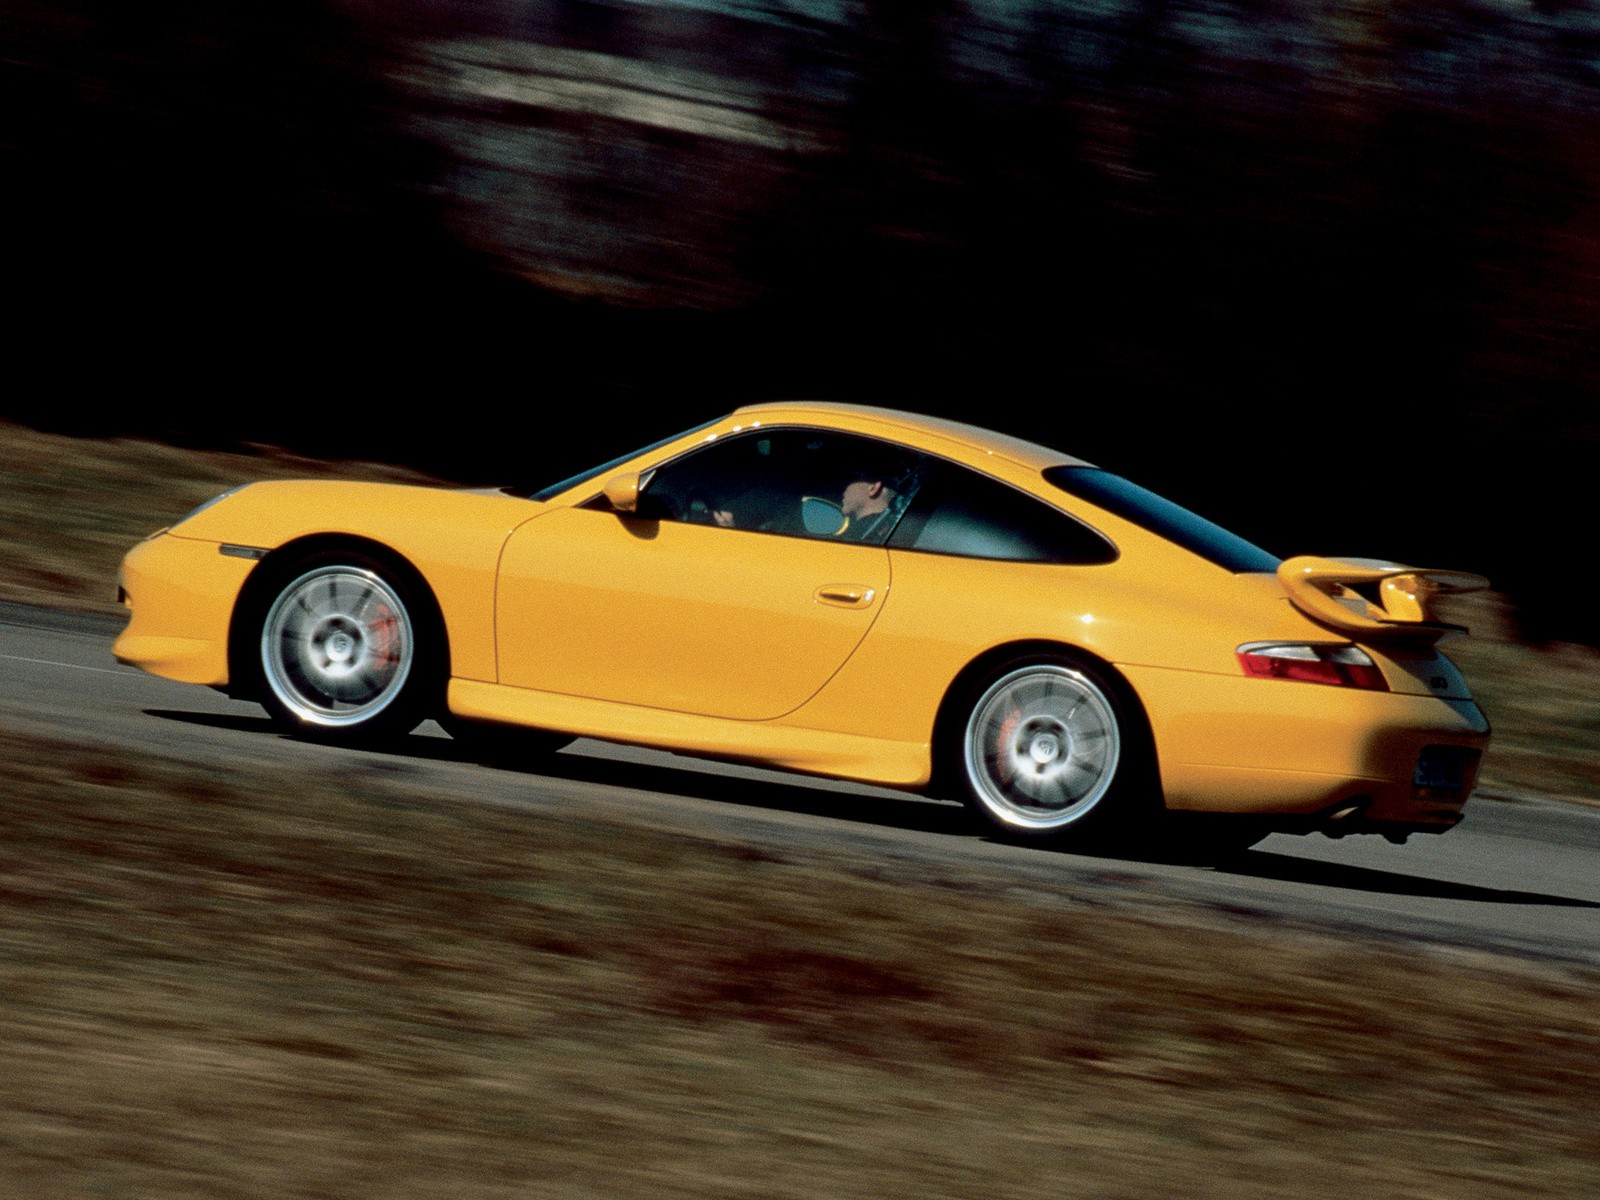 Porsche carrera gt celebrity owned cars